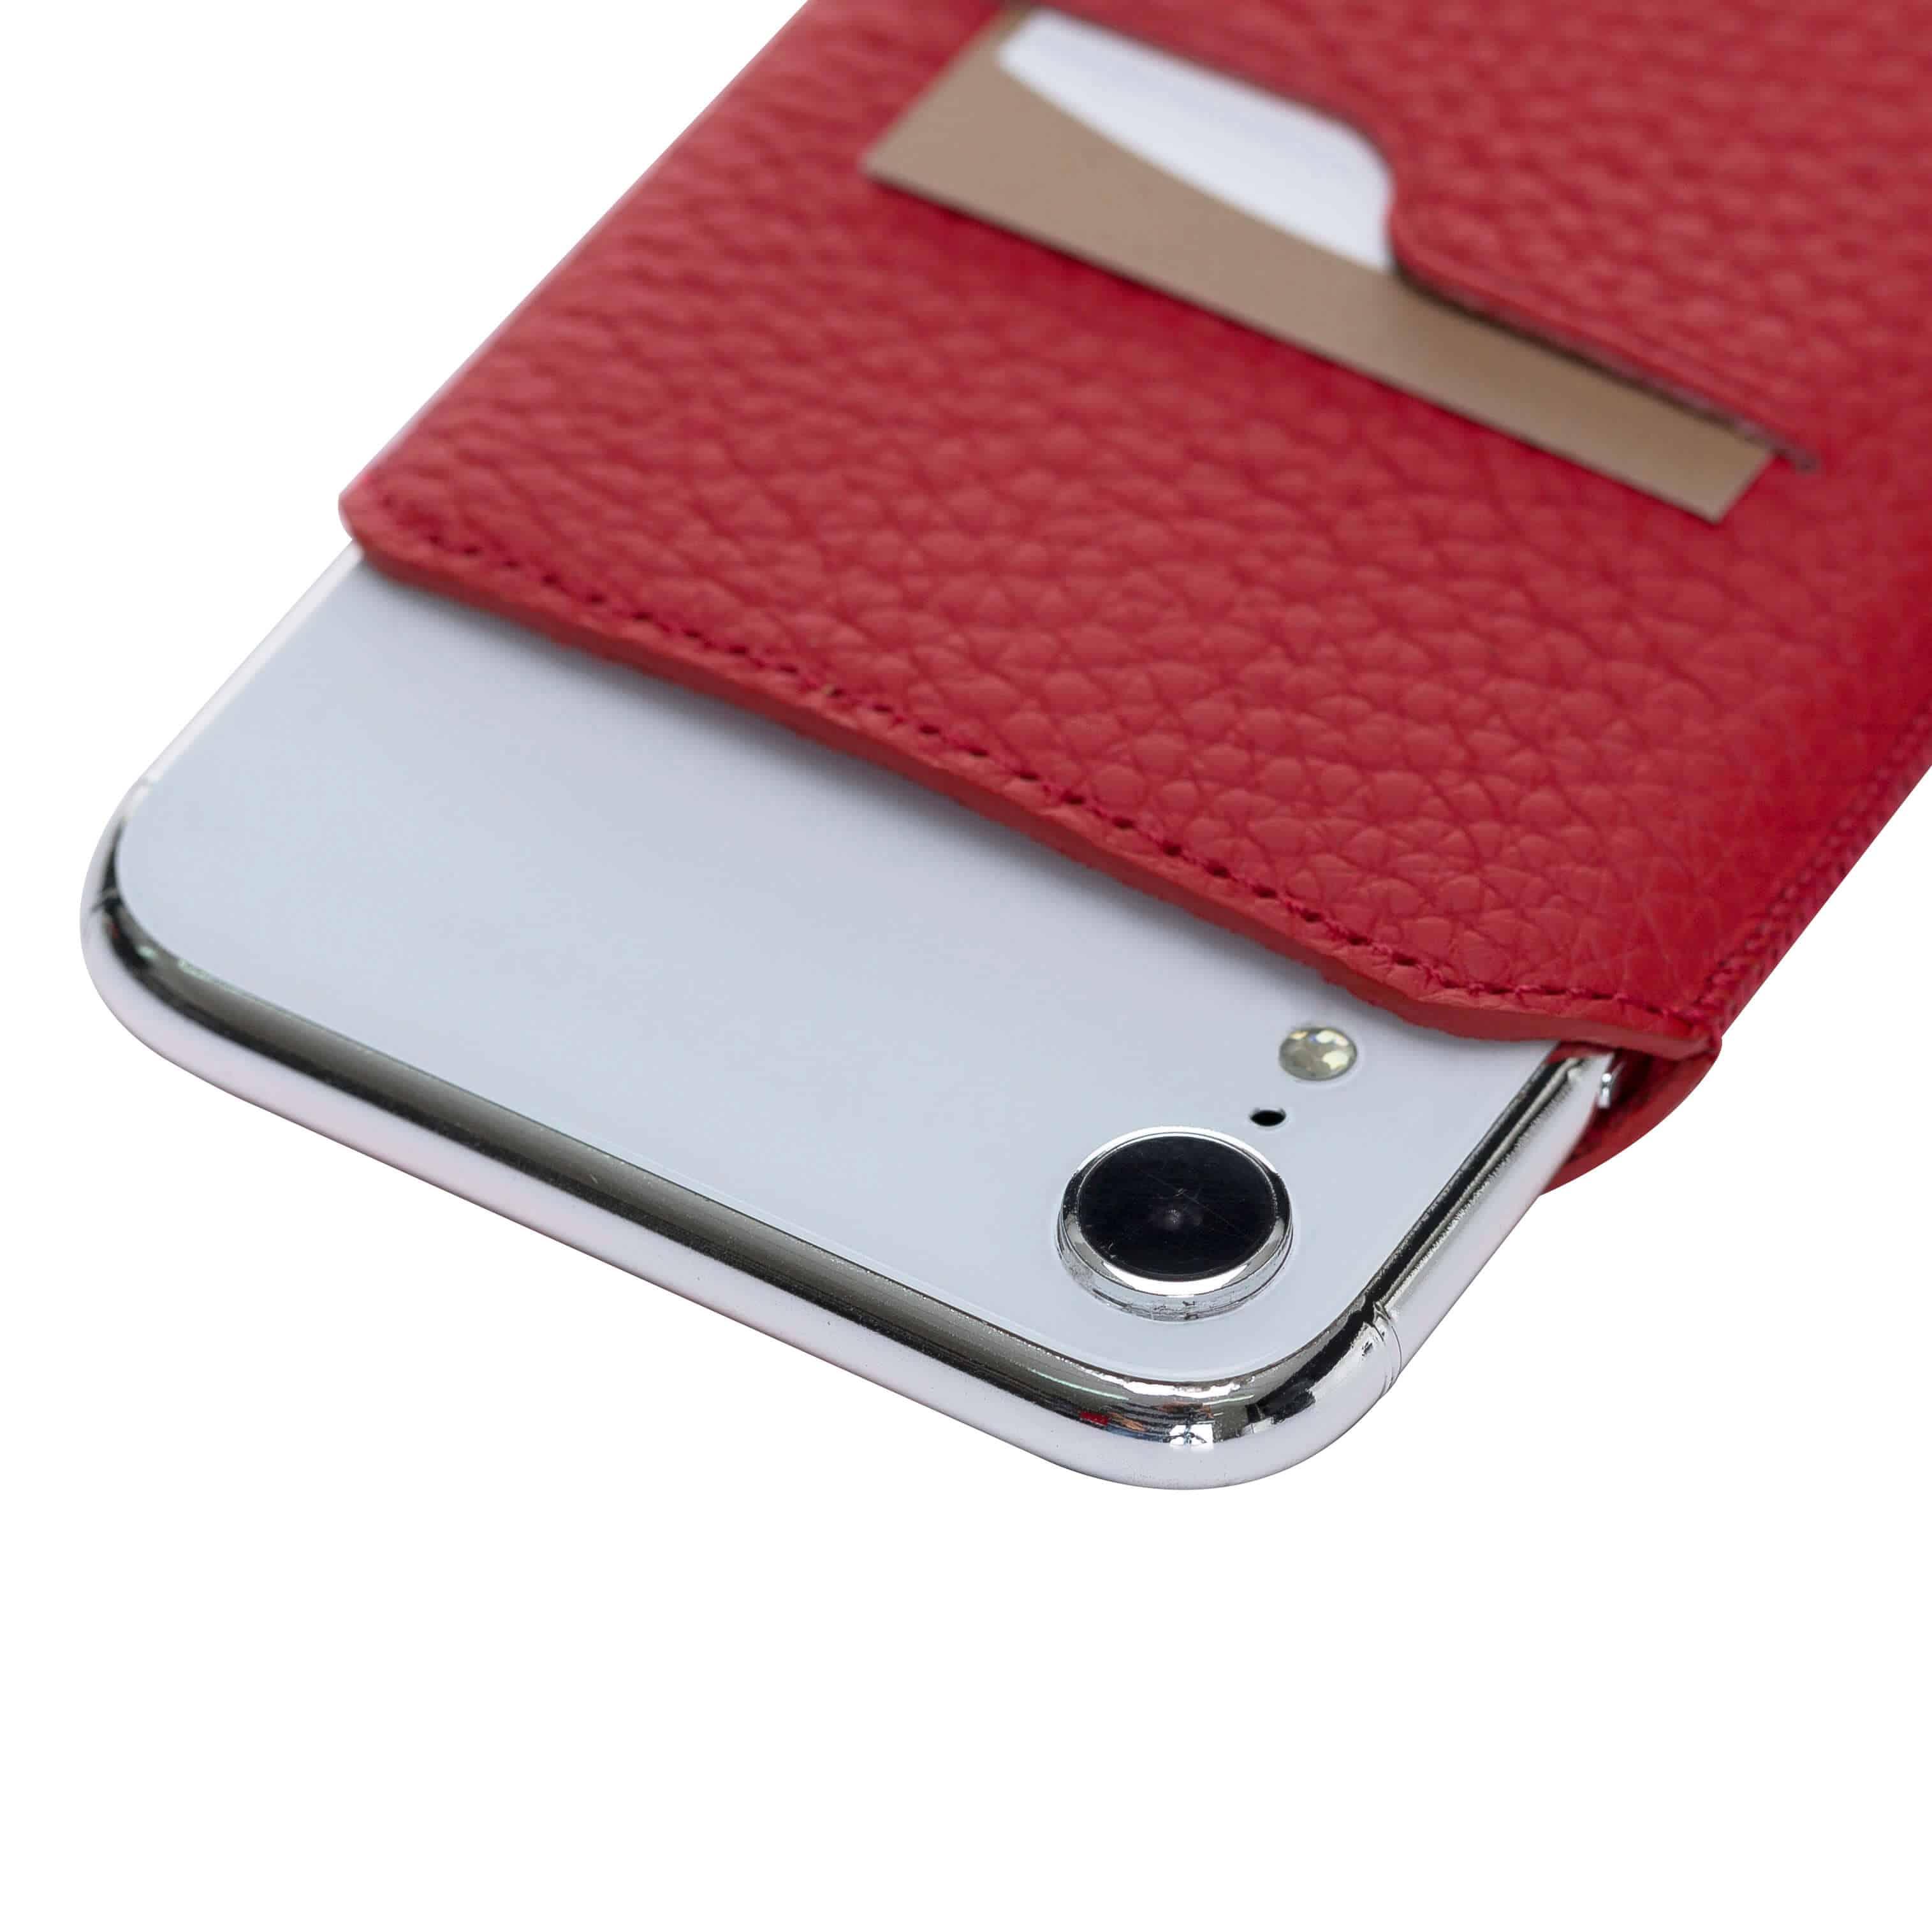 Solo Pelle iPhone XR Hülle I Lederhülle I Ledertasche I Sleeve aus echtem Leder in Floater Blau